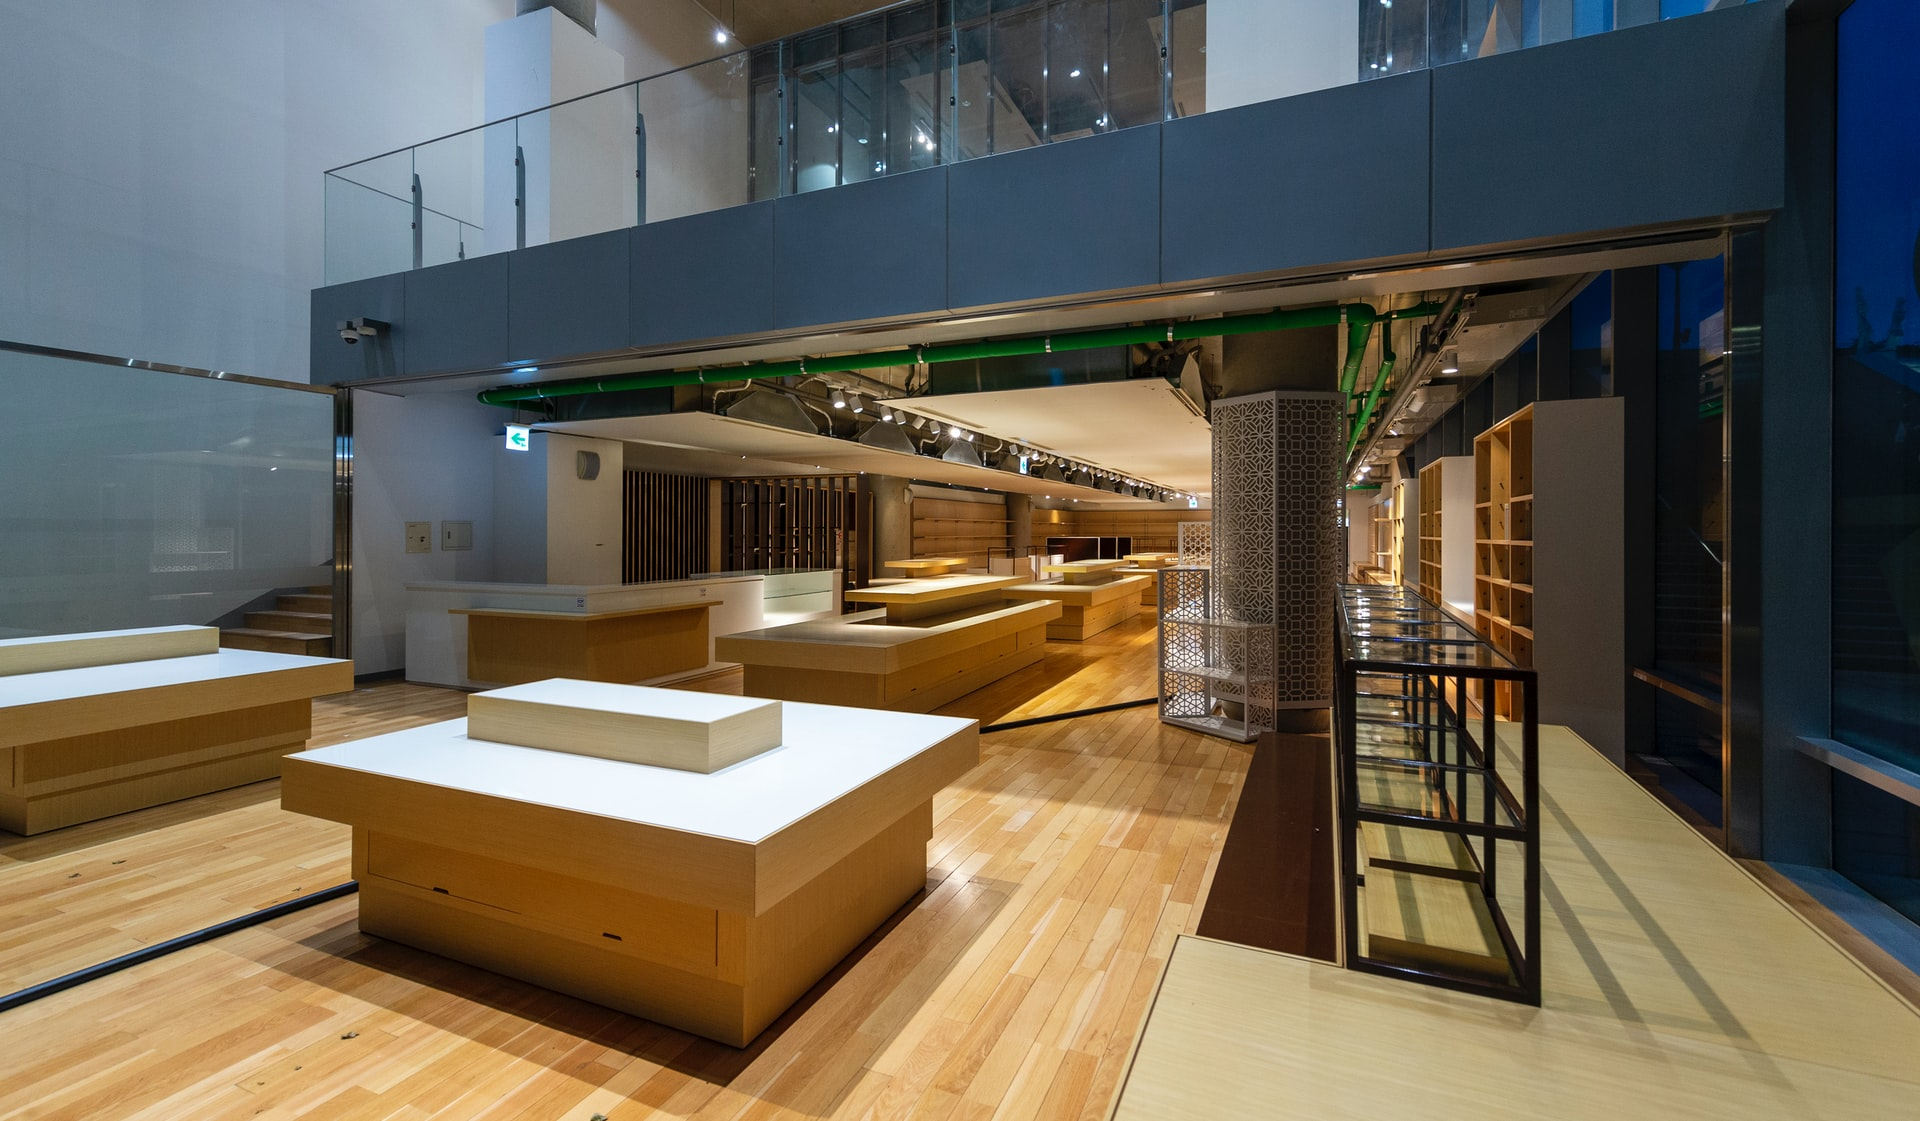 Möbelhaus in Asien